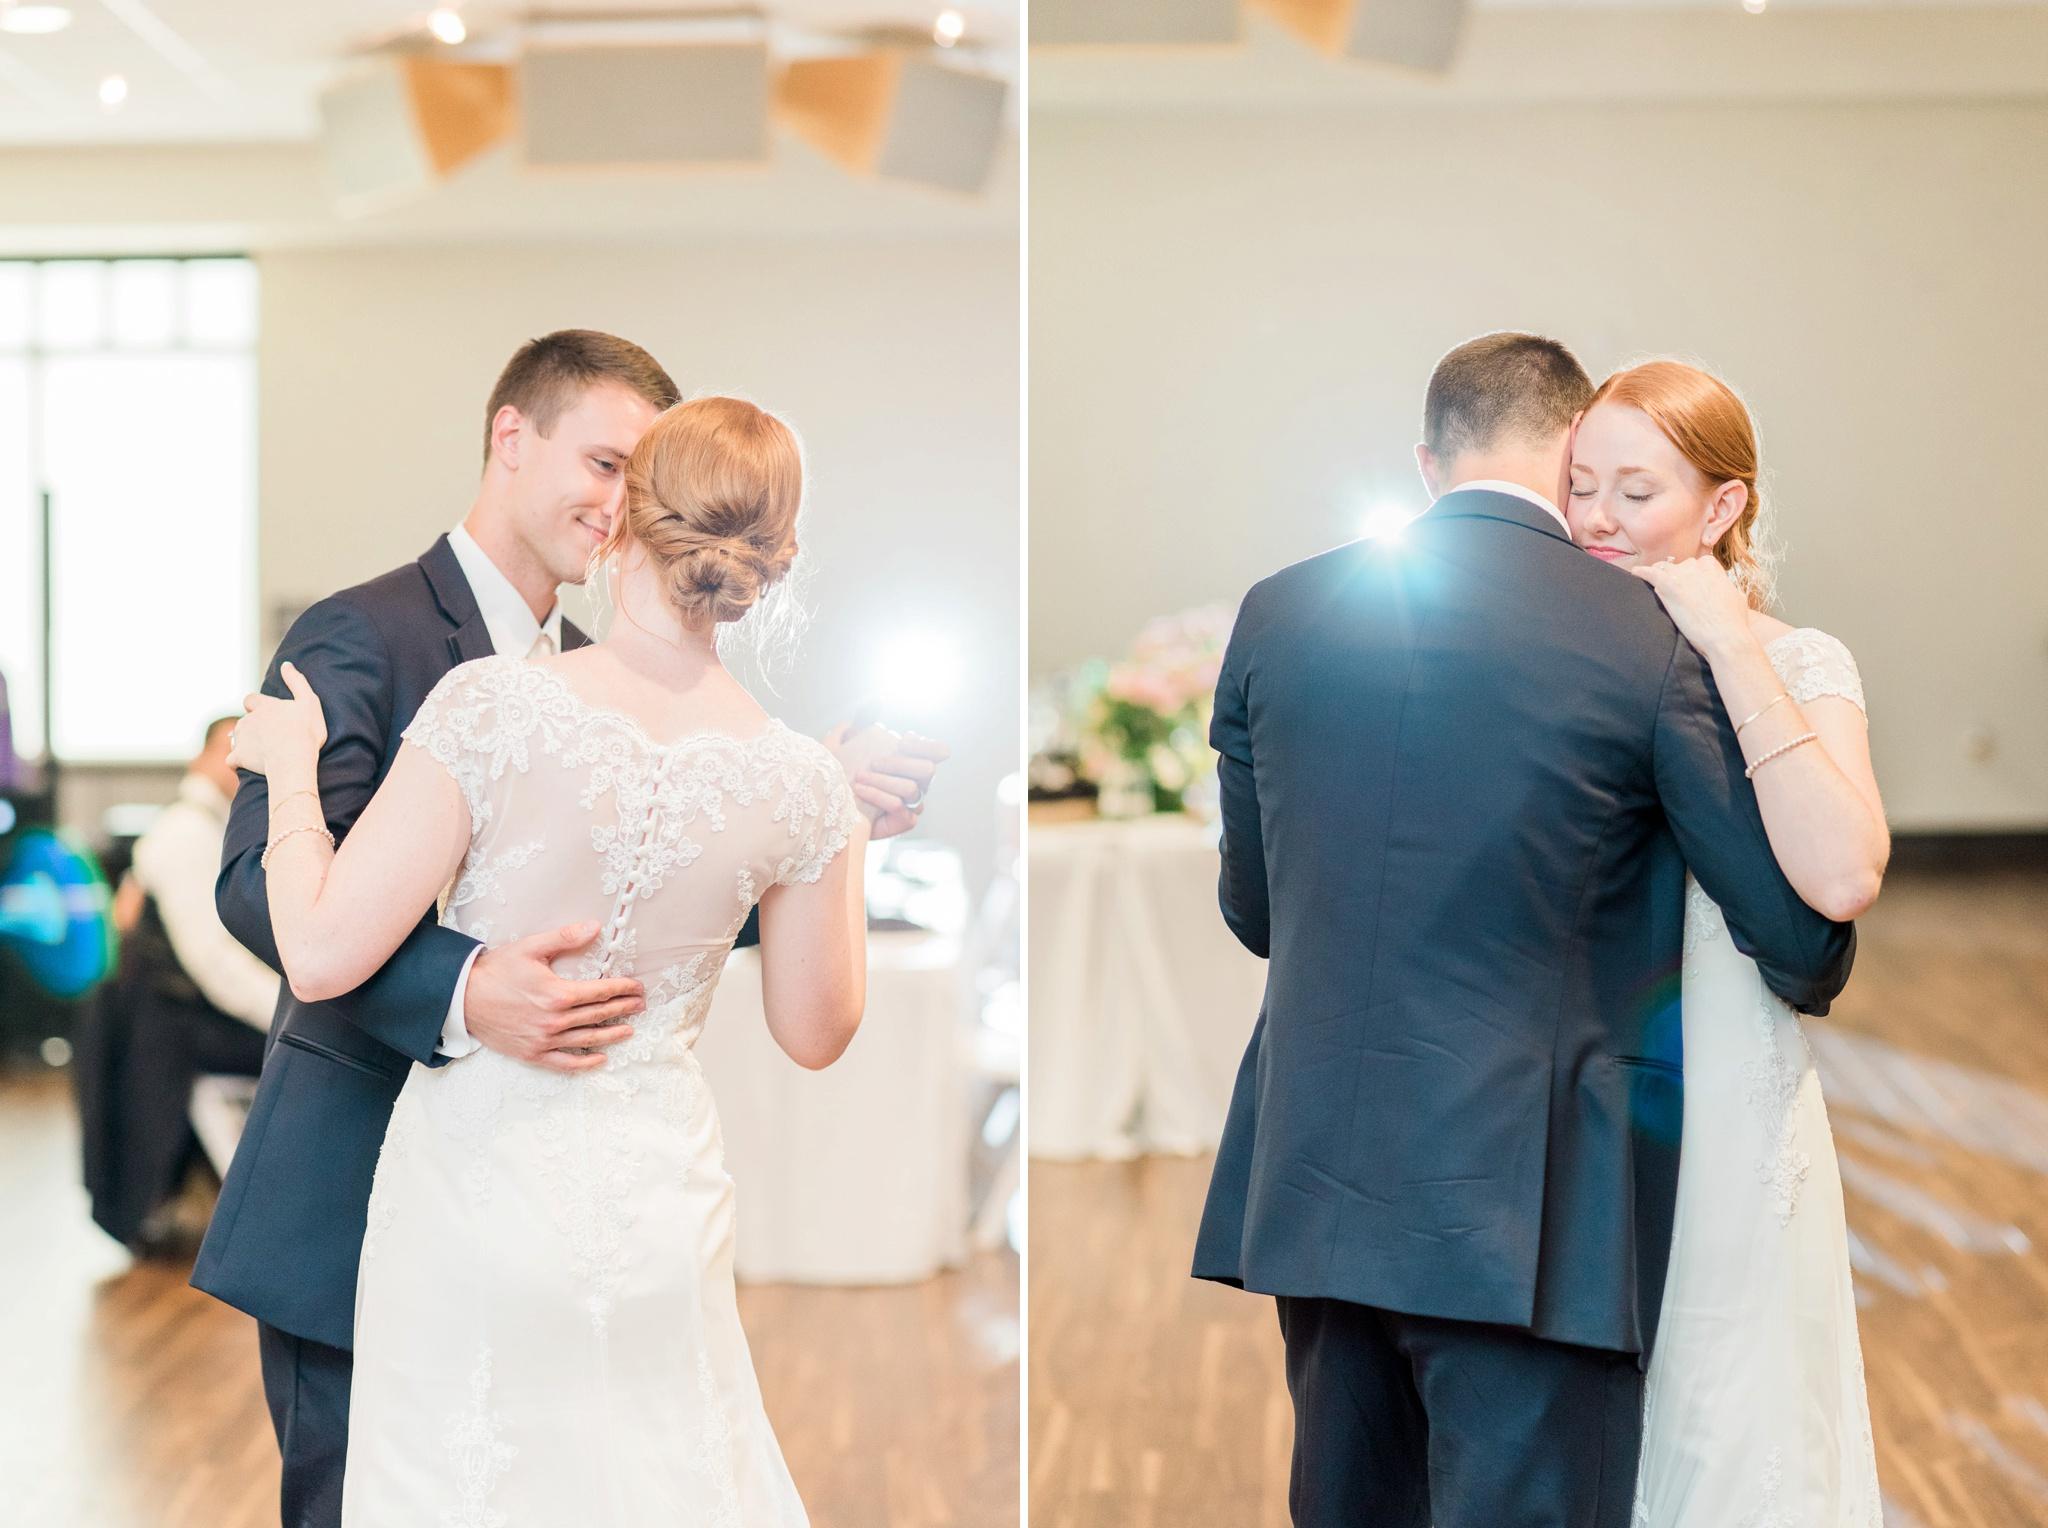 sunbury-ohio-wedding-hannah-johnathan_0138.jpg